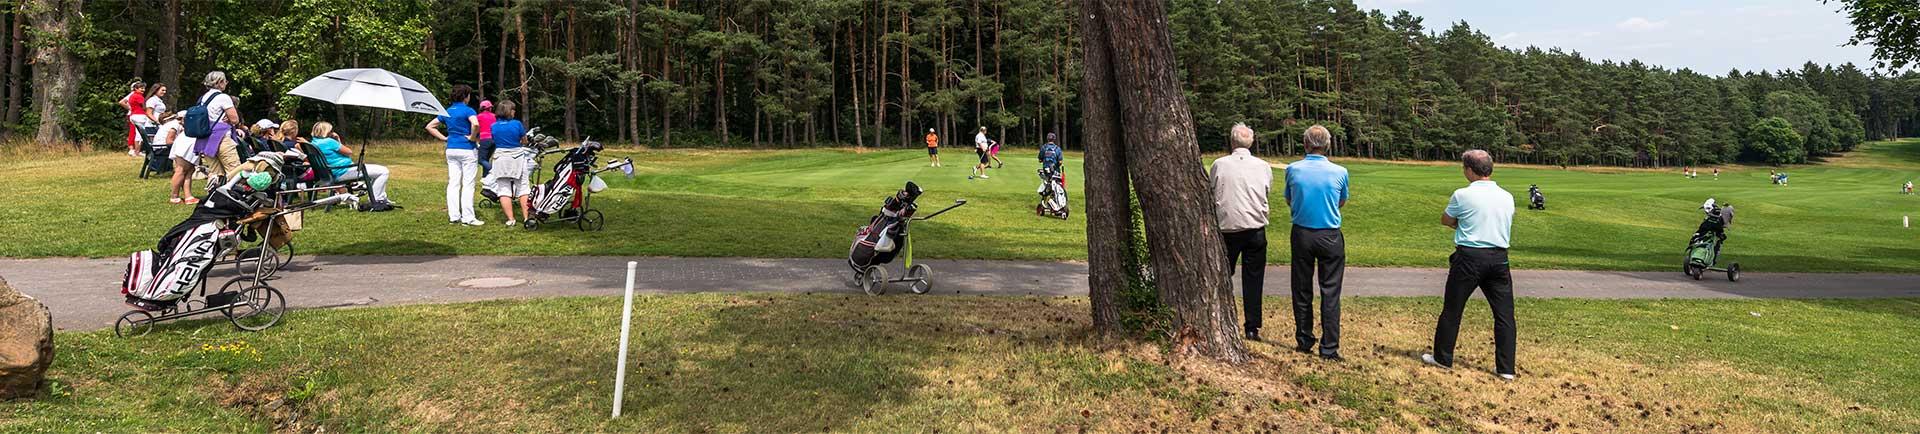 rheinblick-golfcourse-32